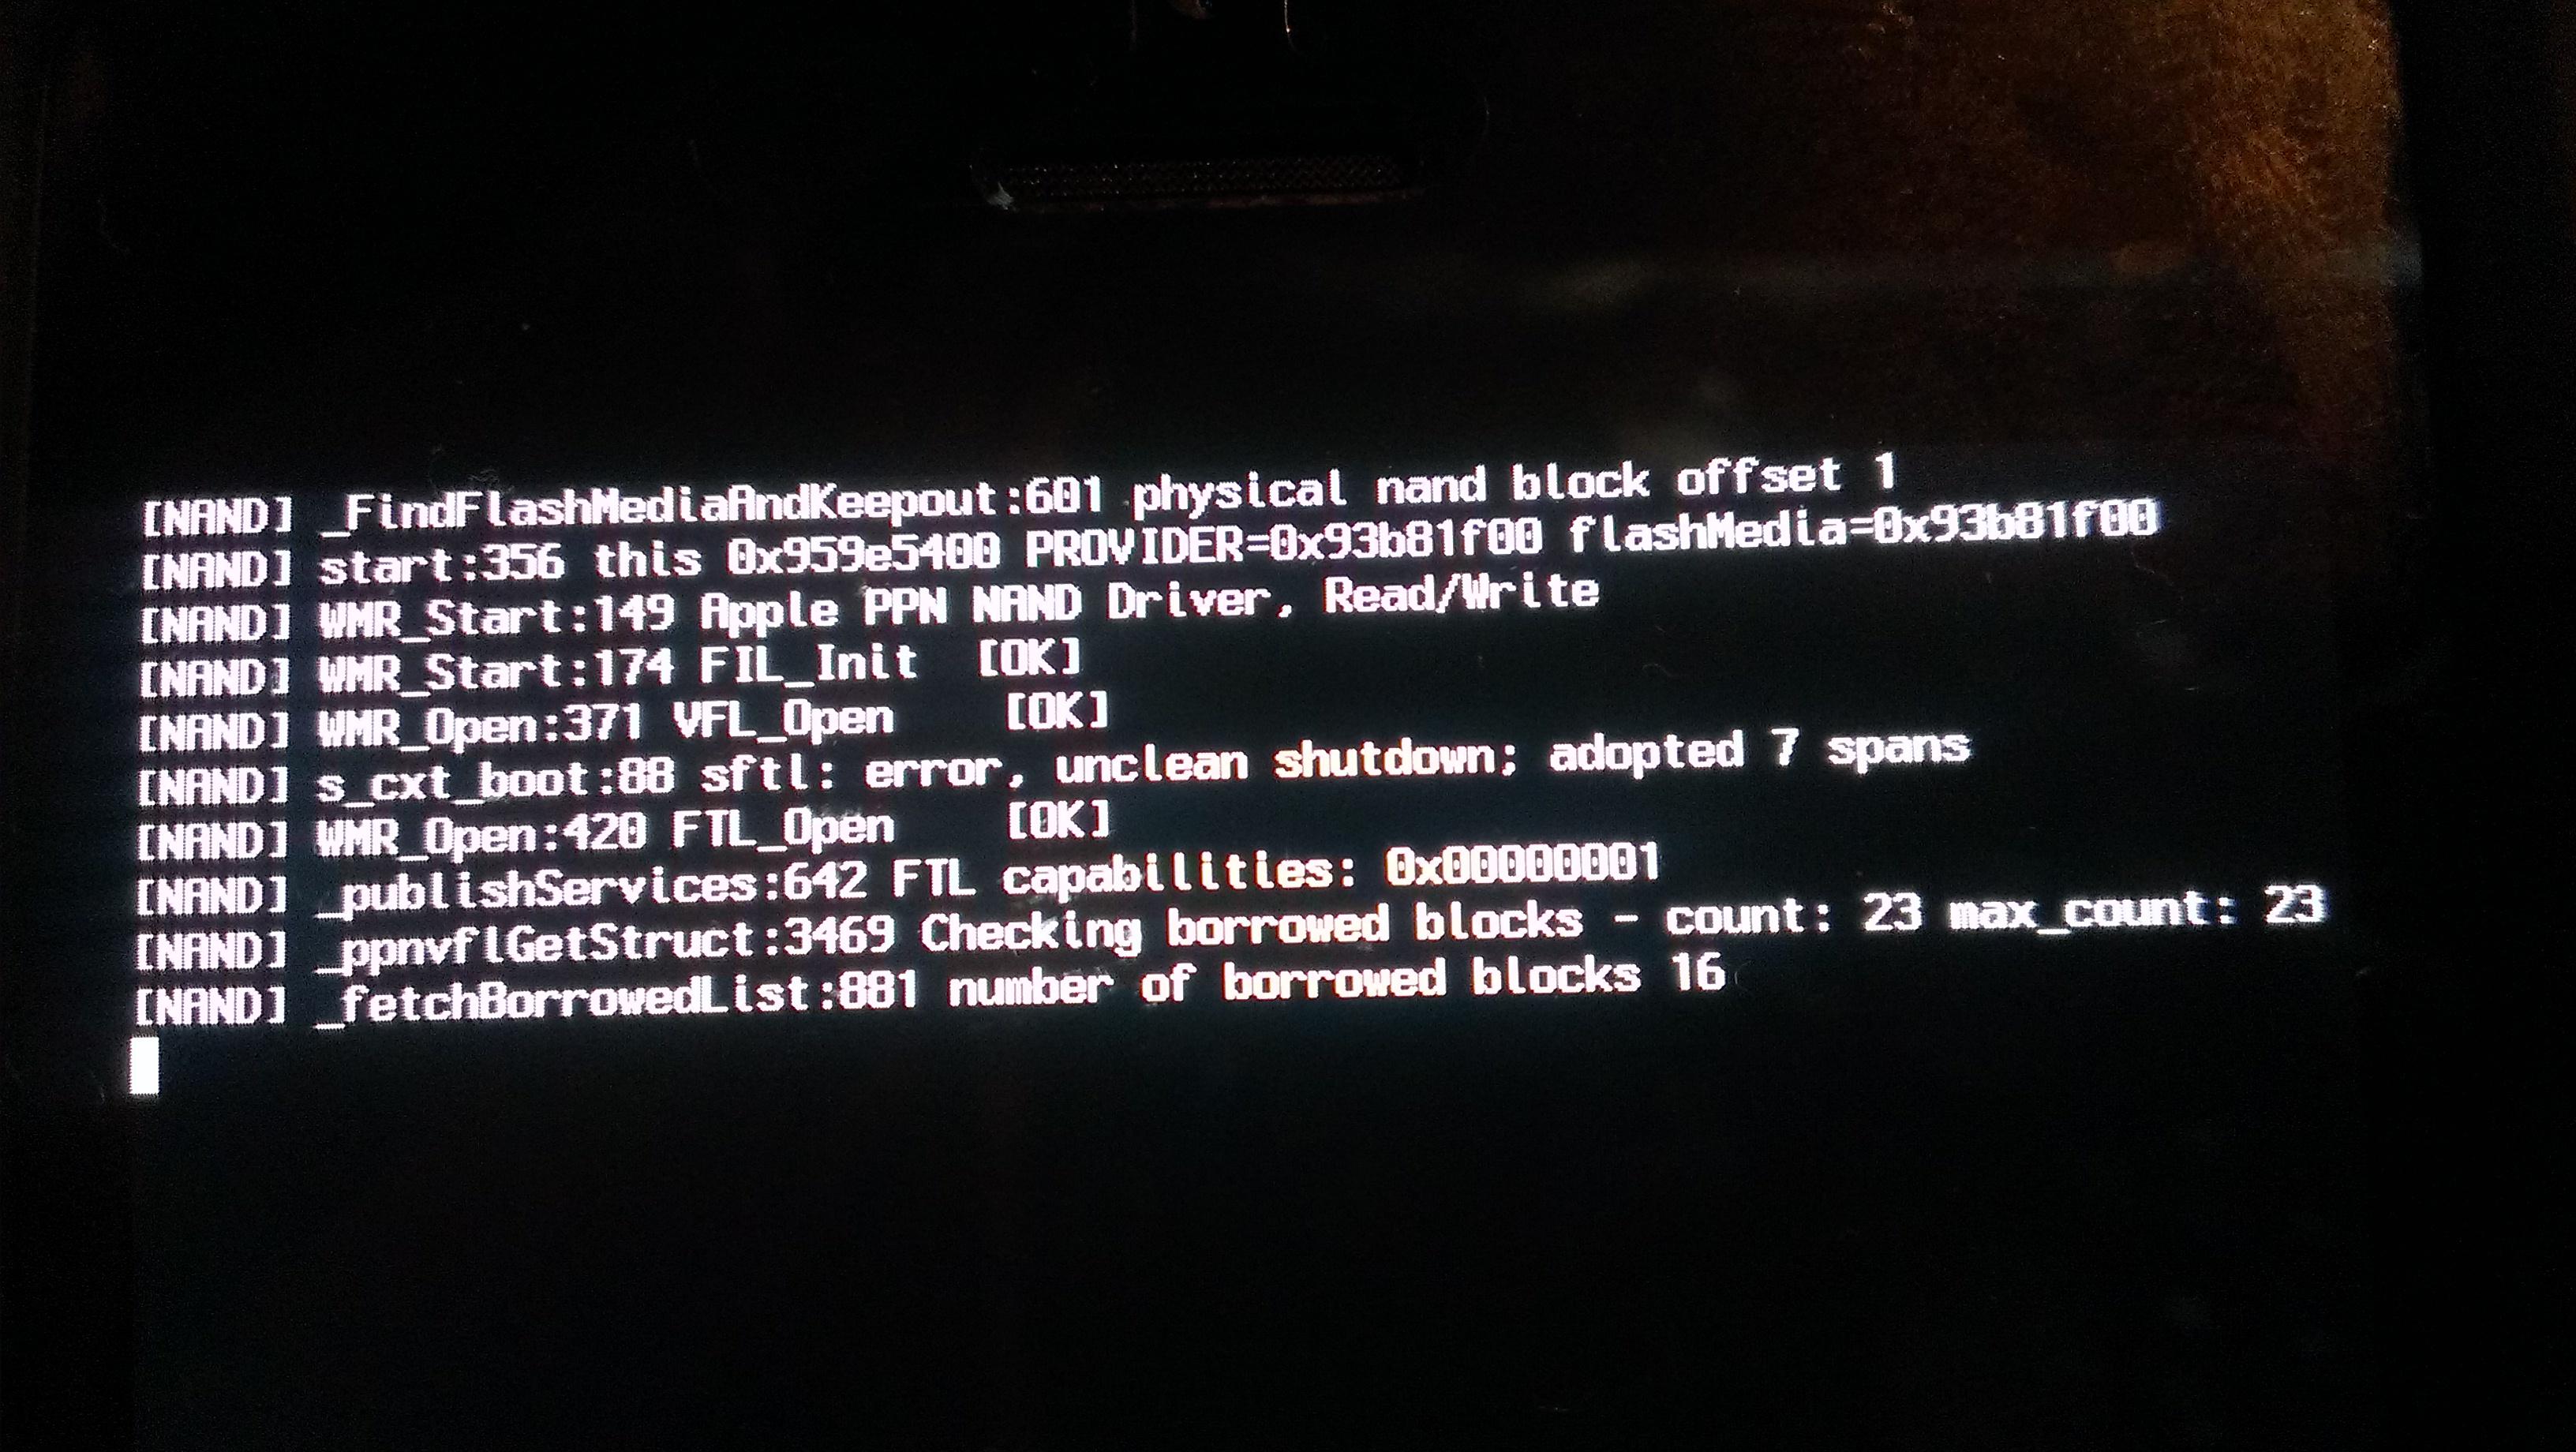 error 4013 Help please - Apple Community